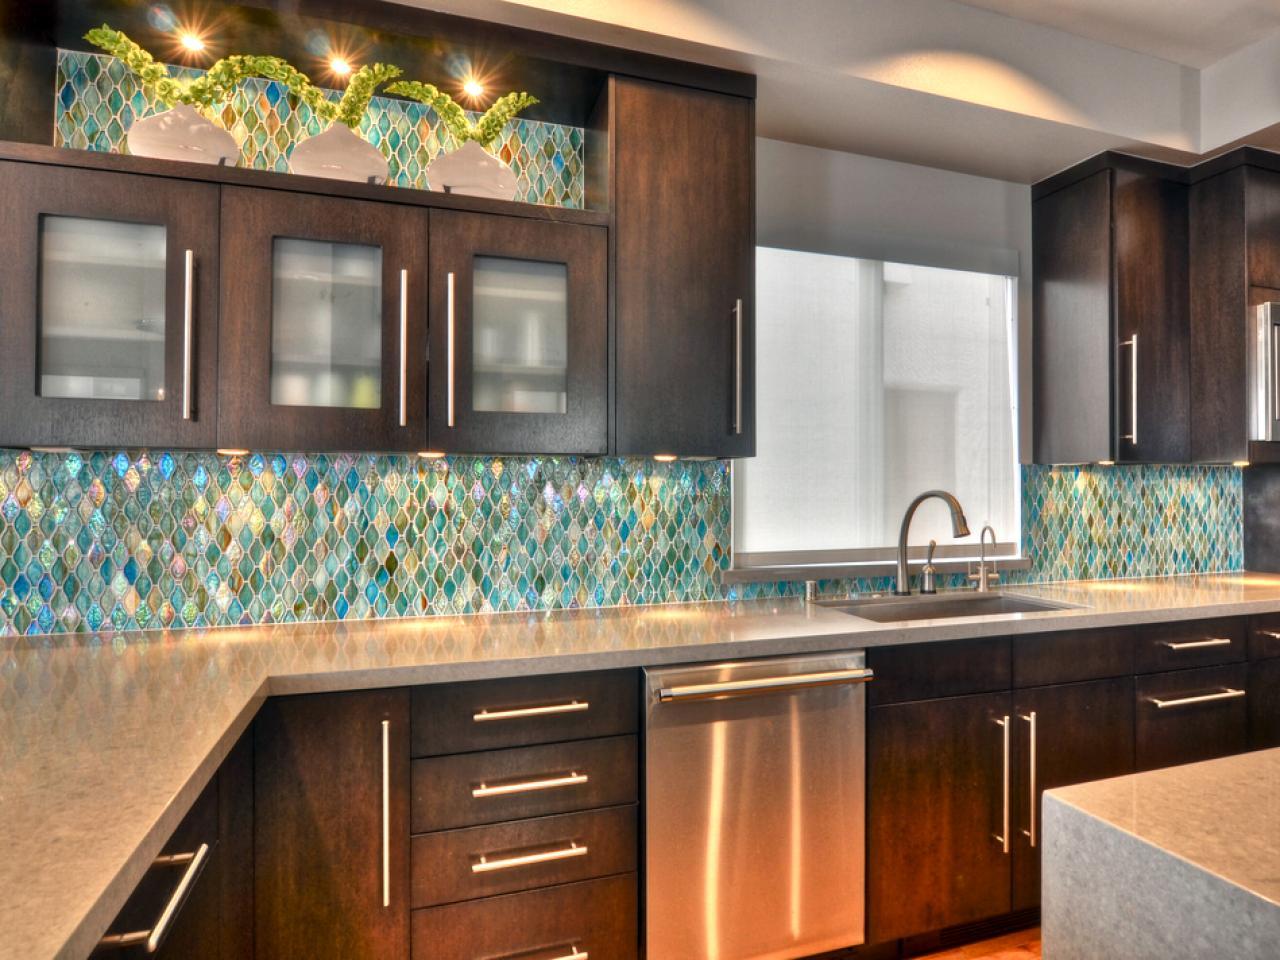 Glass tile kitchen backsplash.